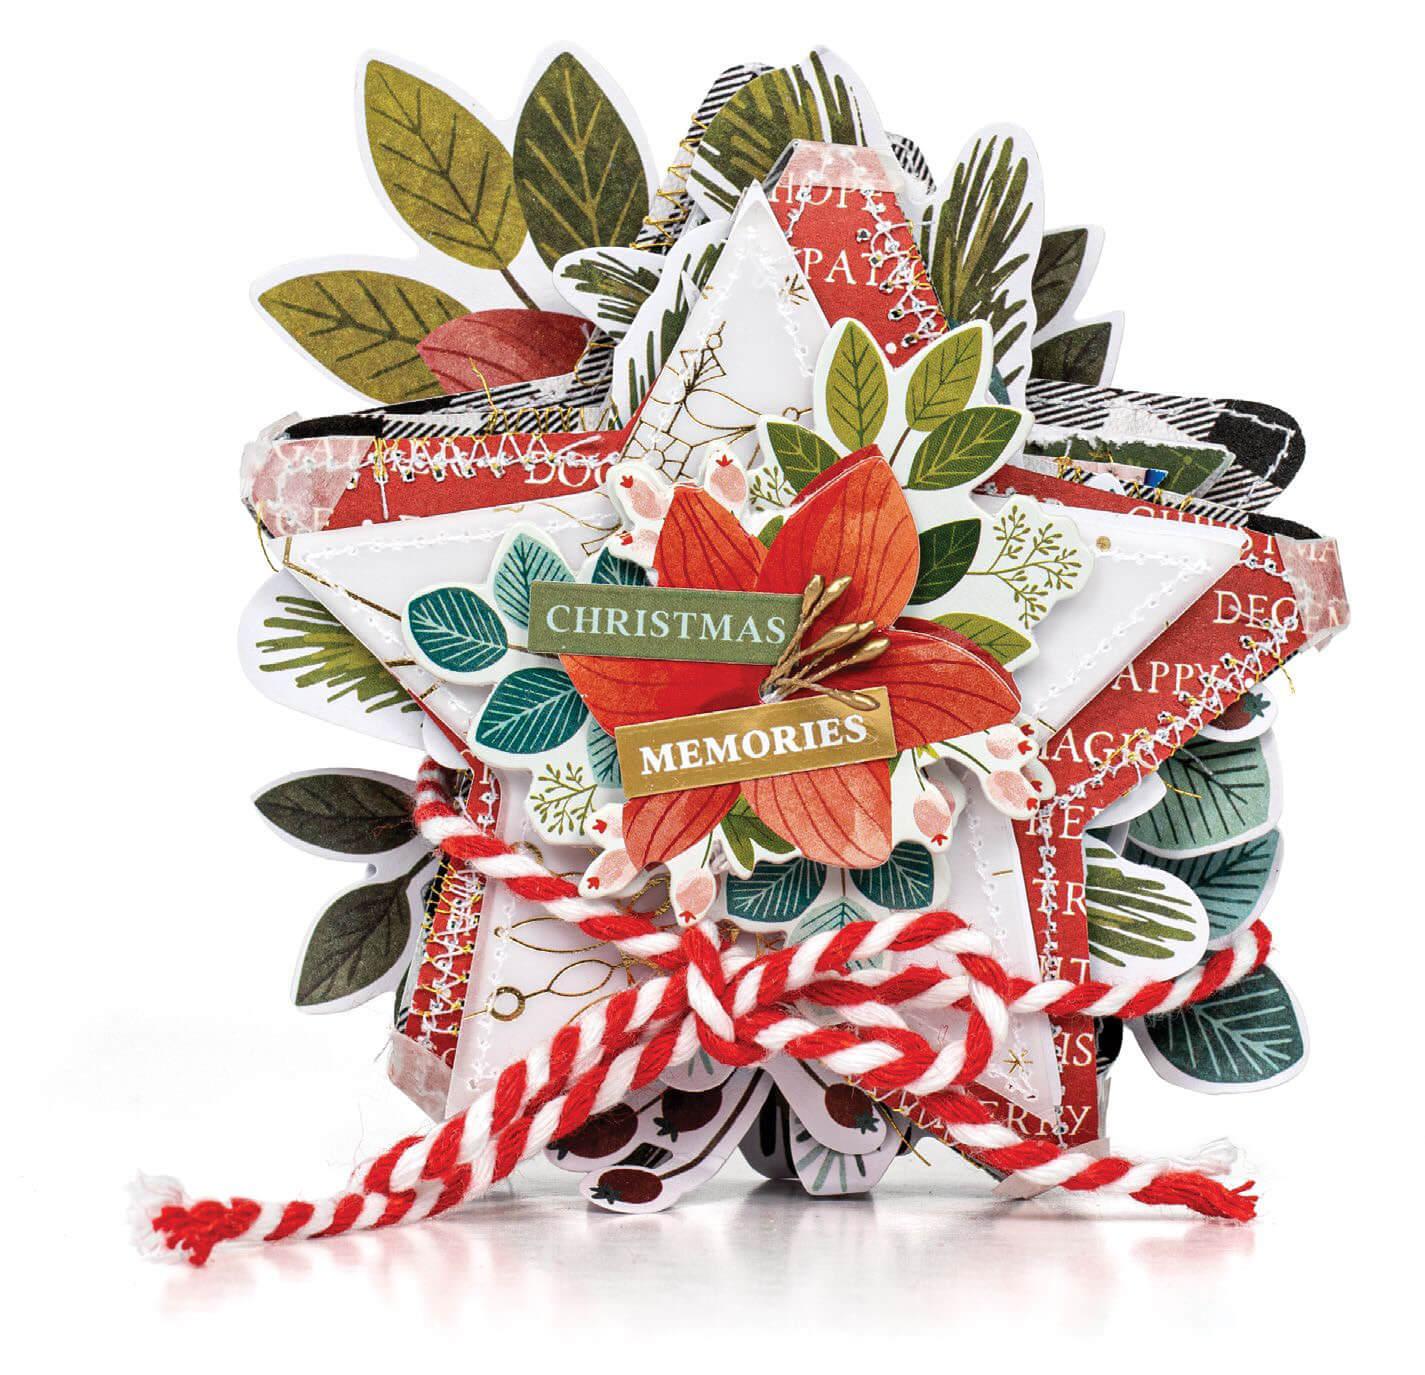 Scrapbook & Cards Today - Winter 2019 - Christmas Memories mini album by Paige Evans